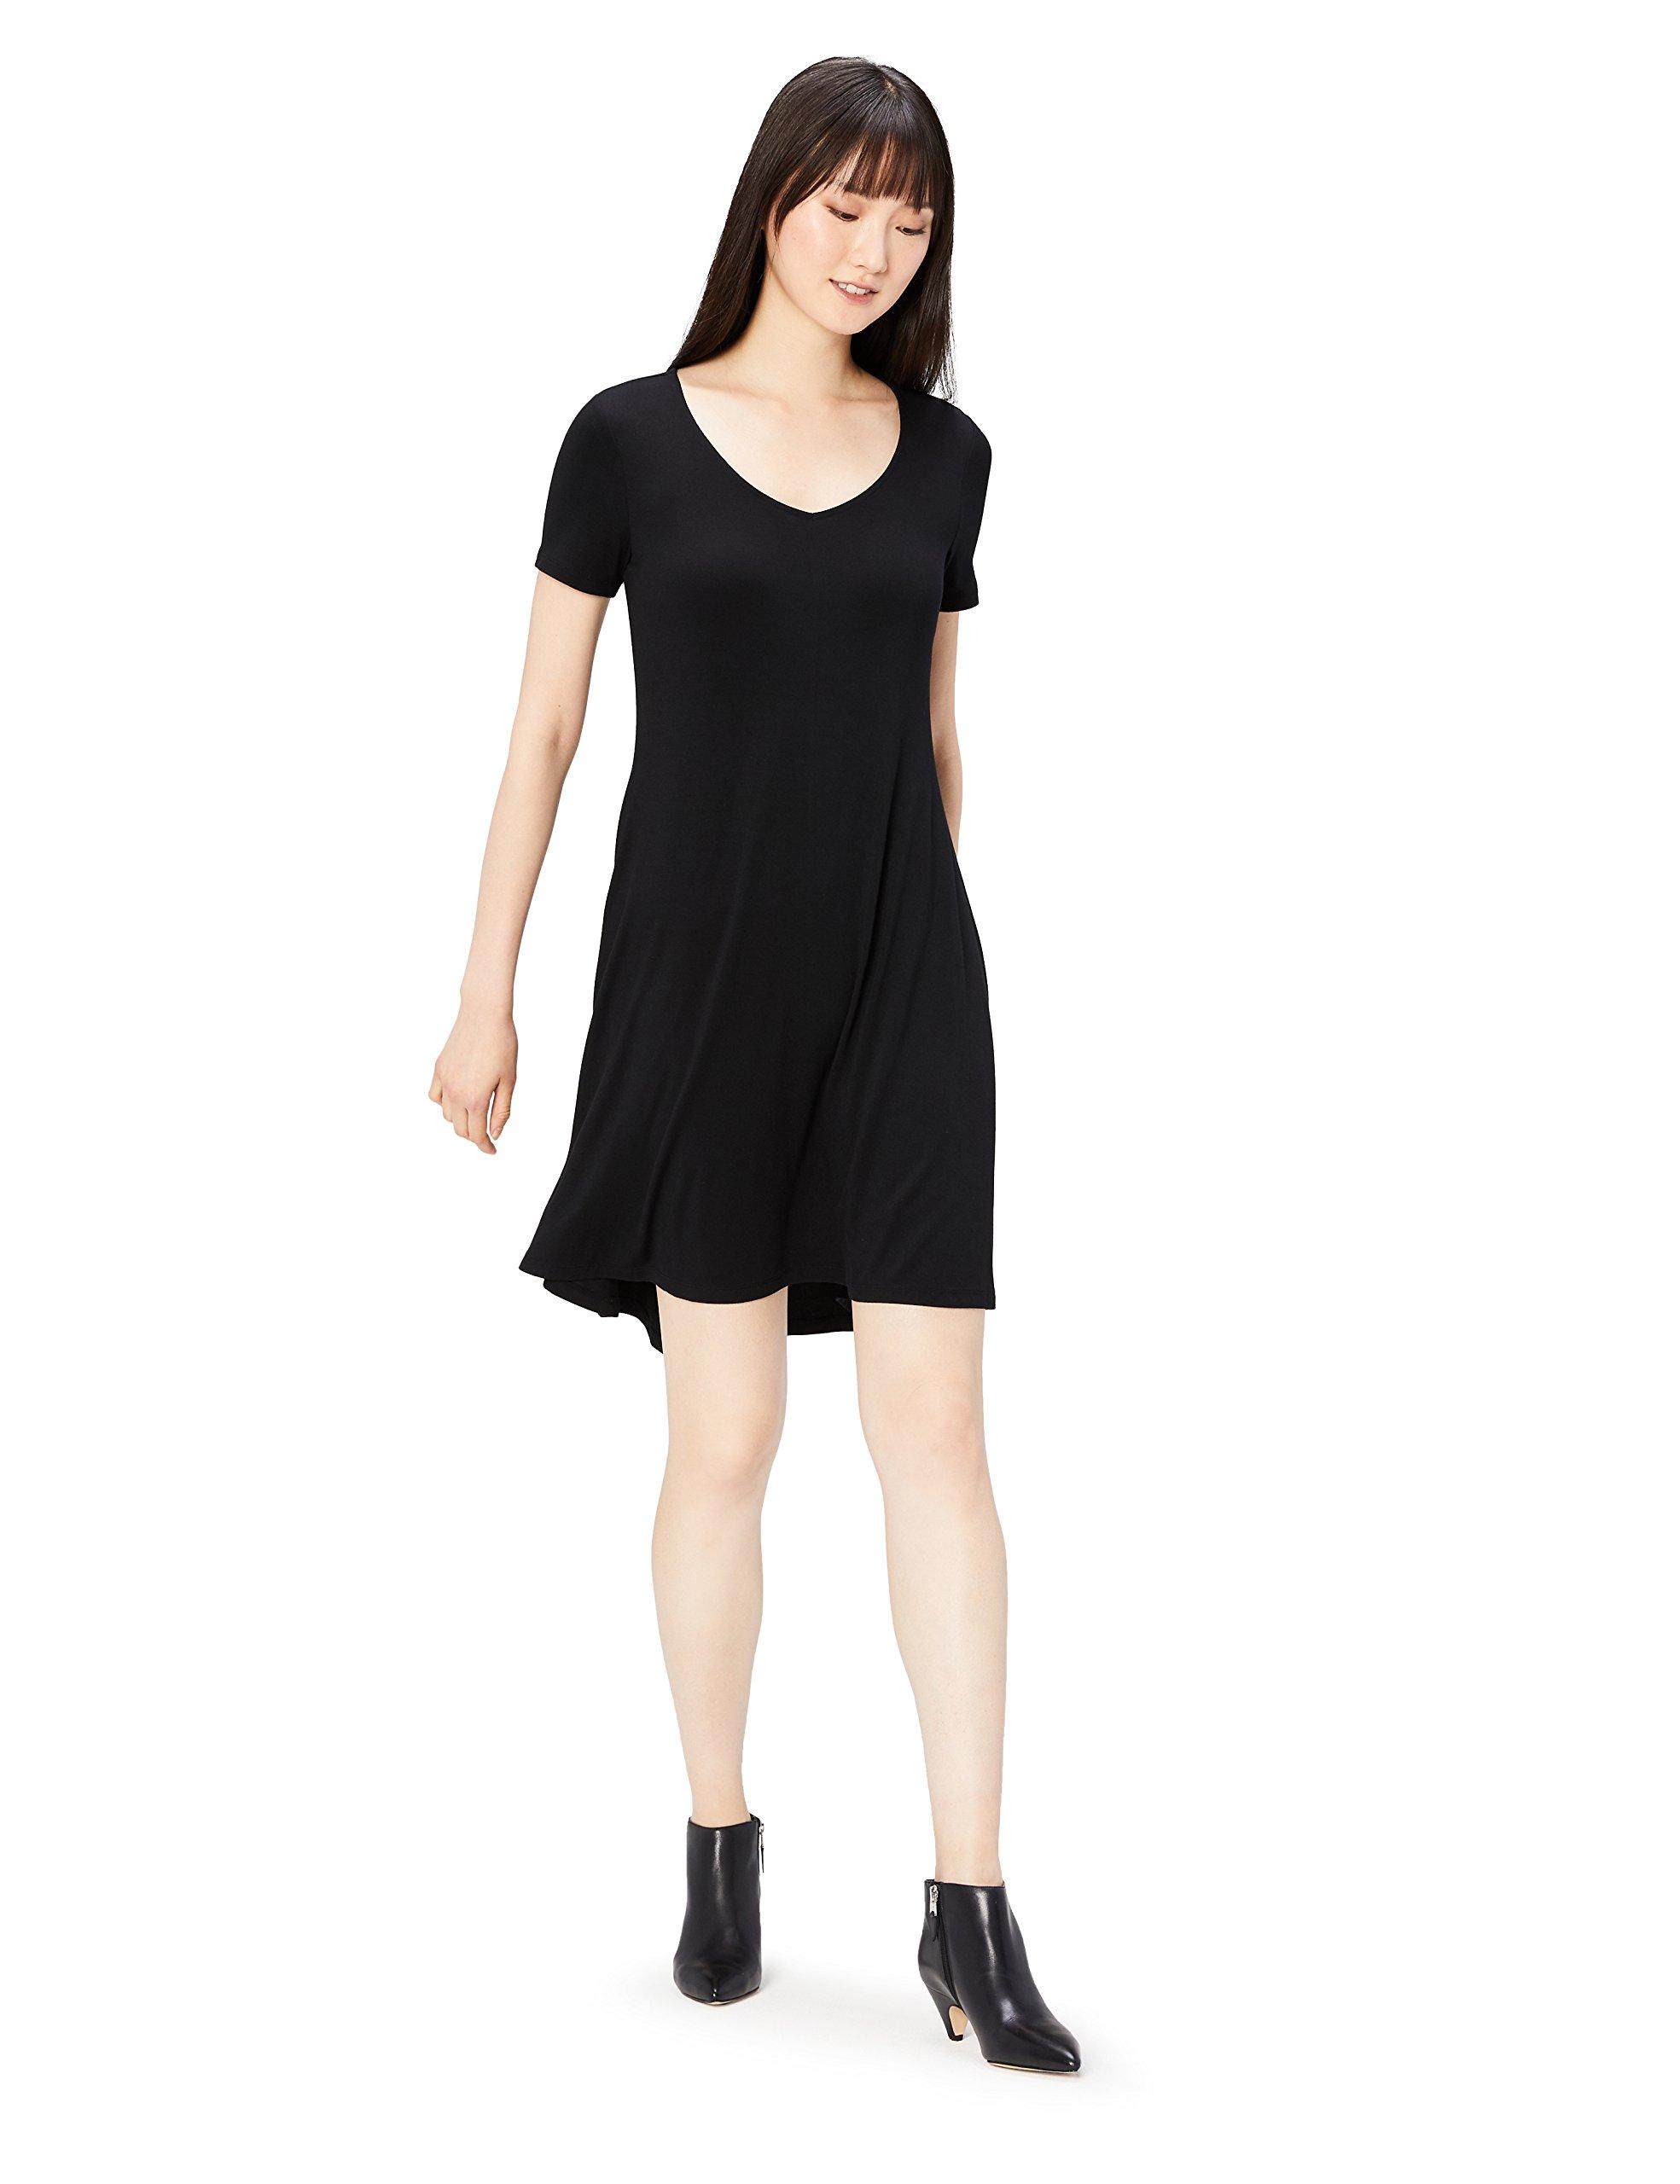 Daily Ritual Women's Jersey Short-Sleeve V-Neck Dress, Black, XX-Large